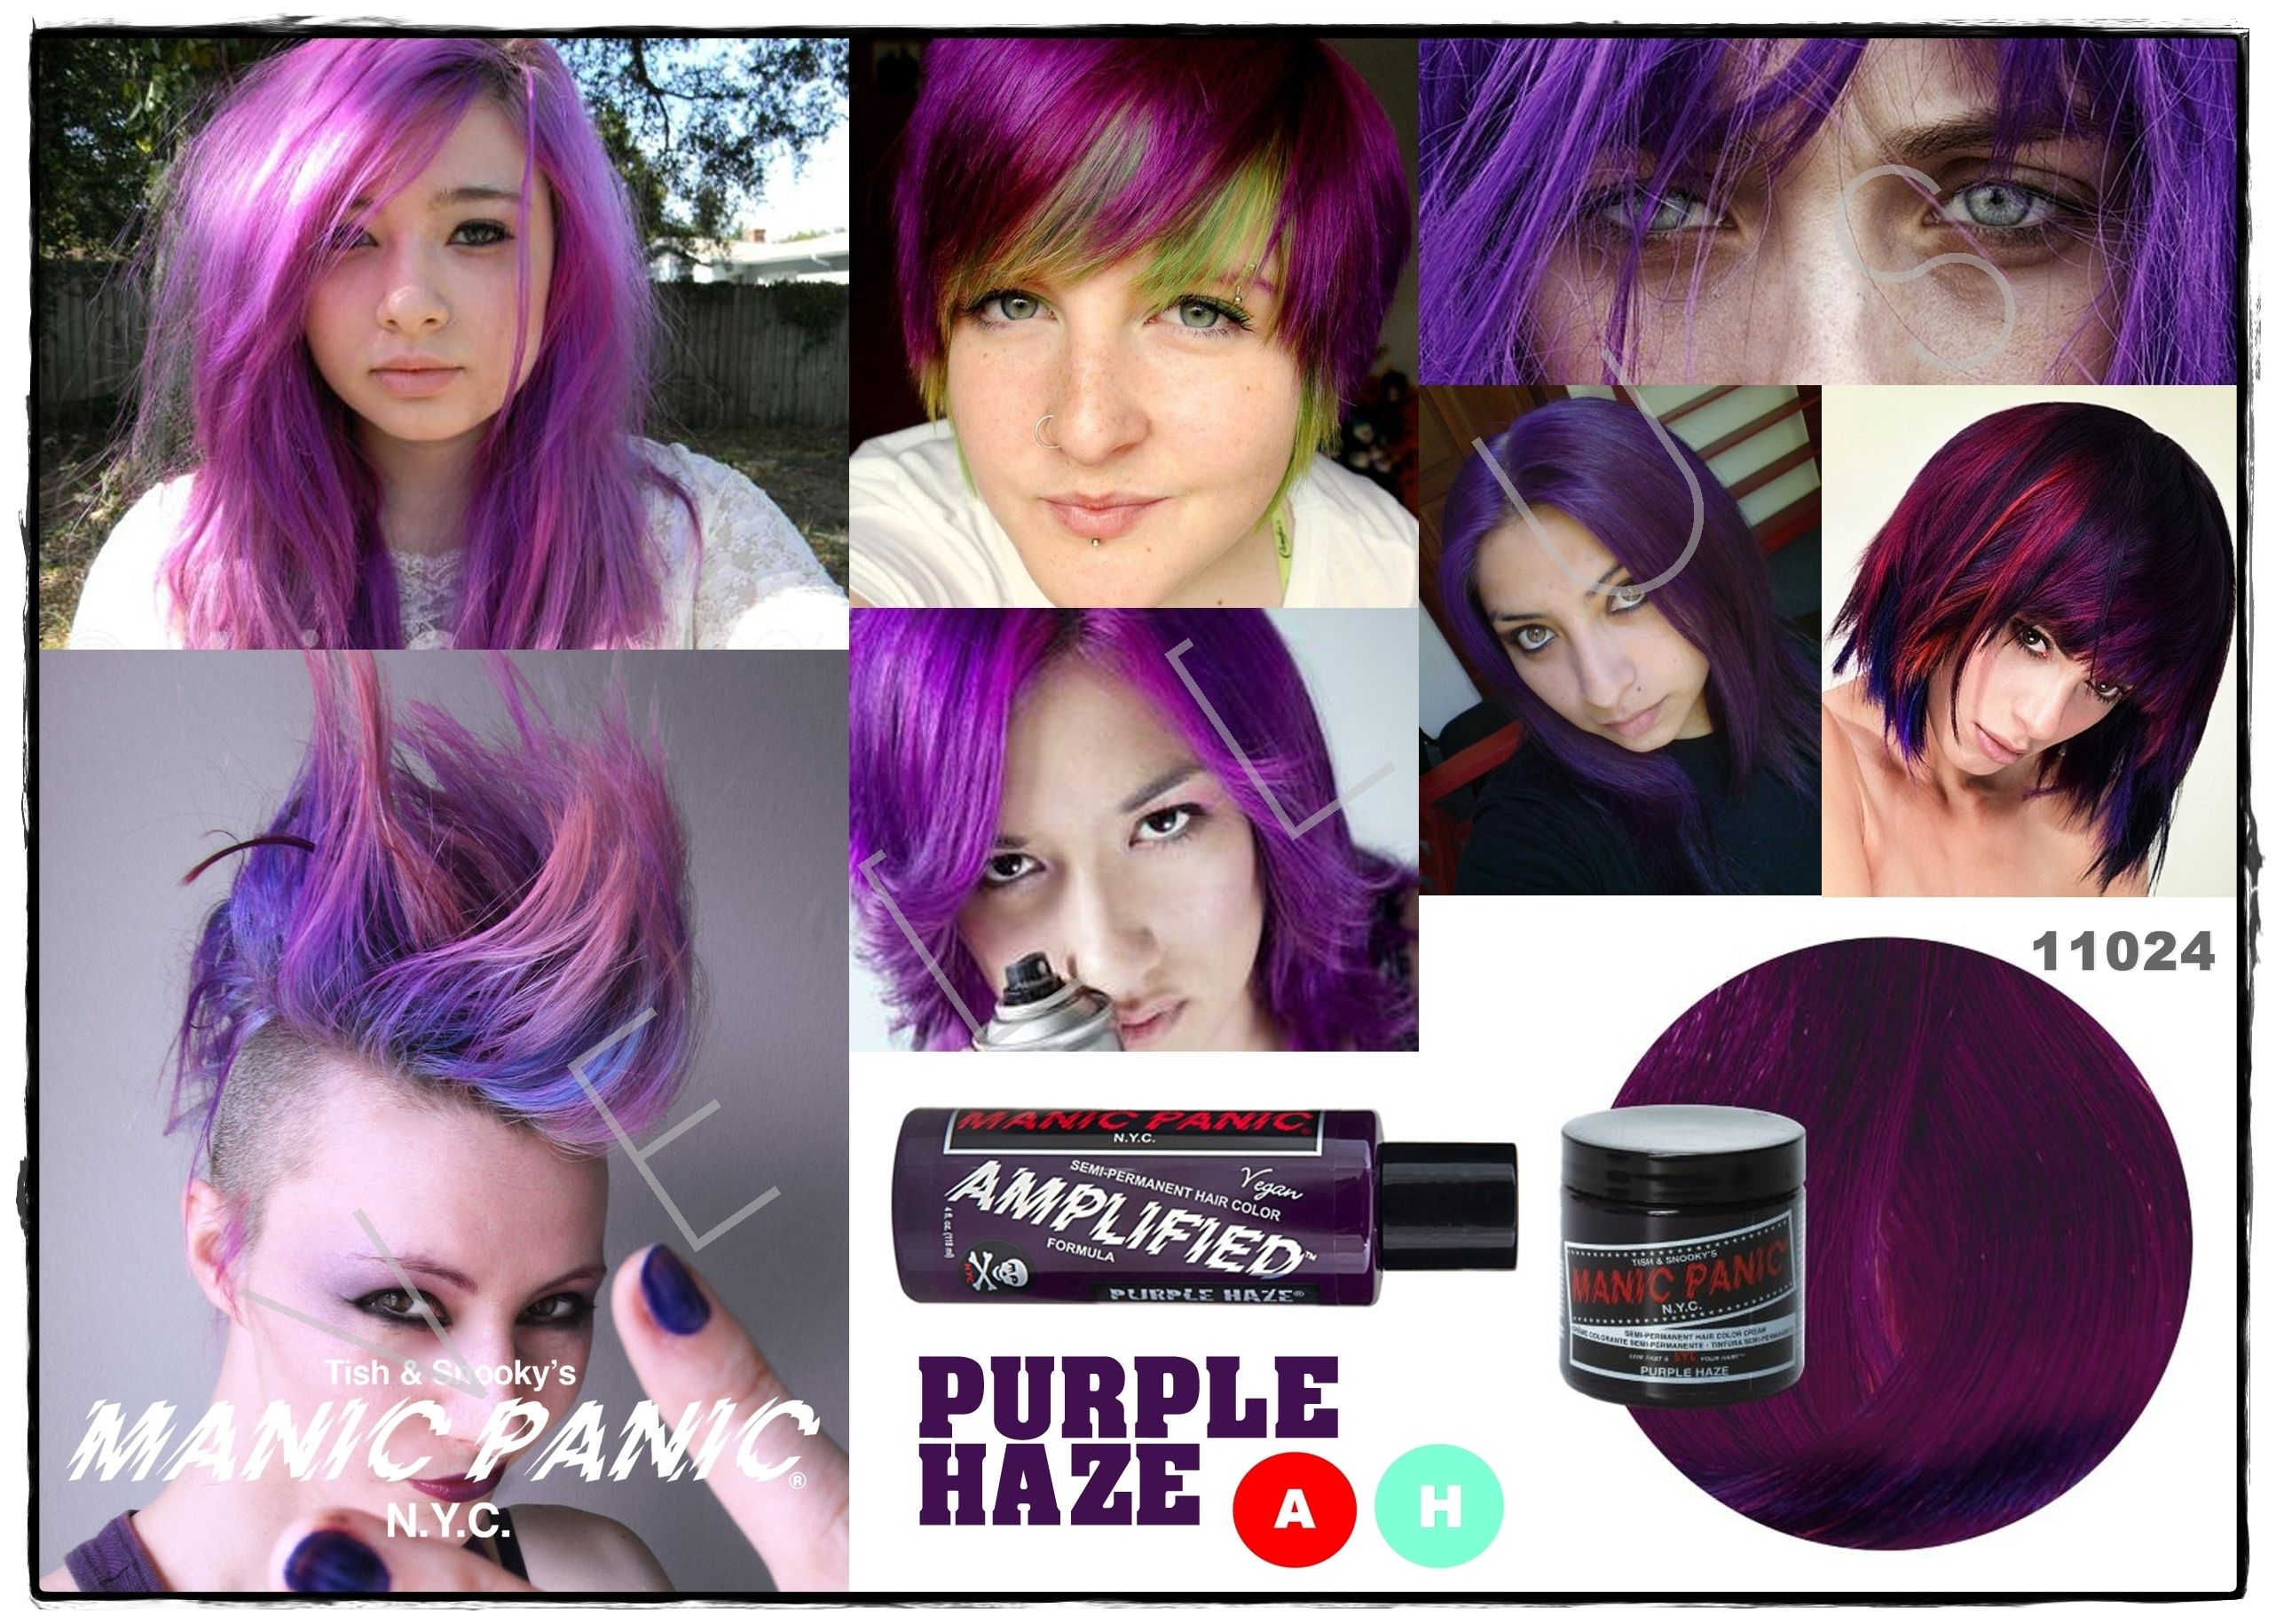 Manic Panic Amplified Purple Haze Vellus Hair Studio 83a Tanjong